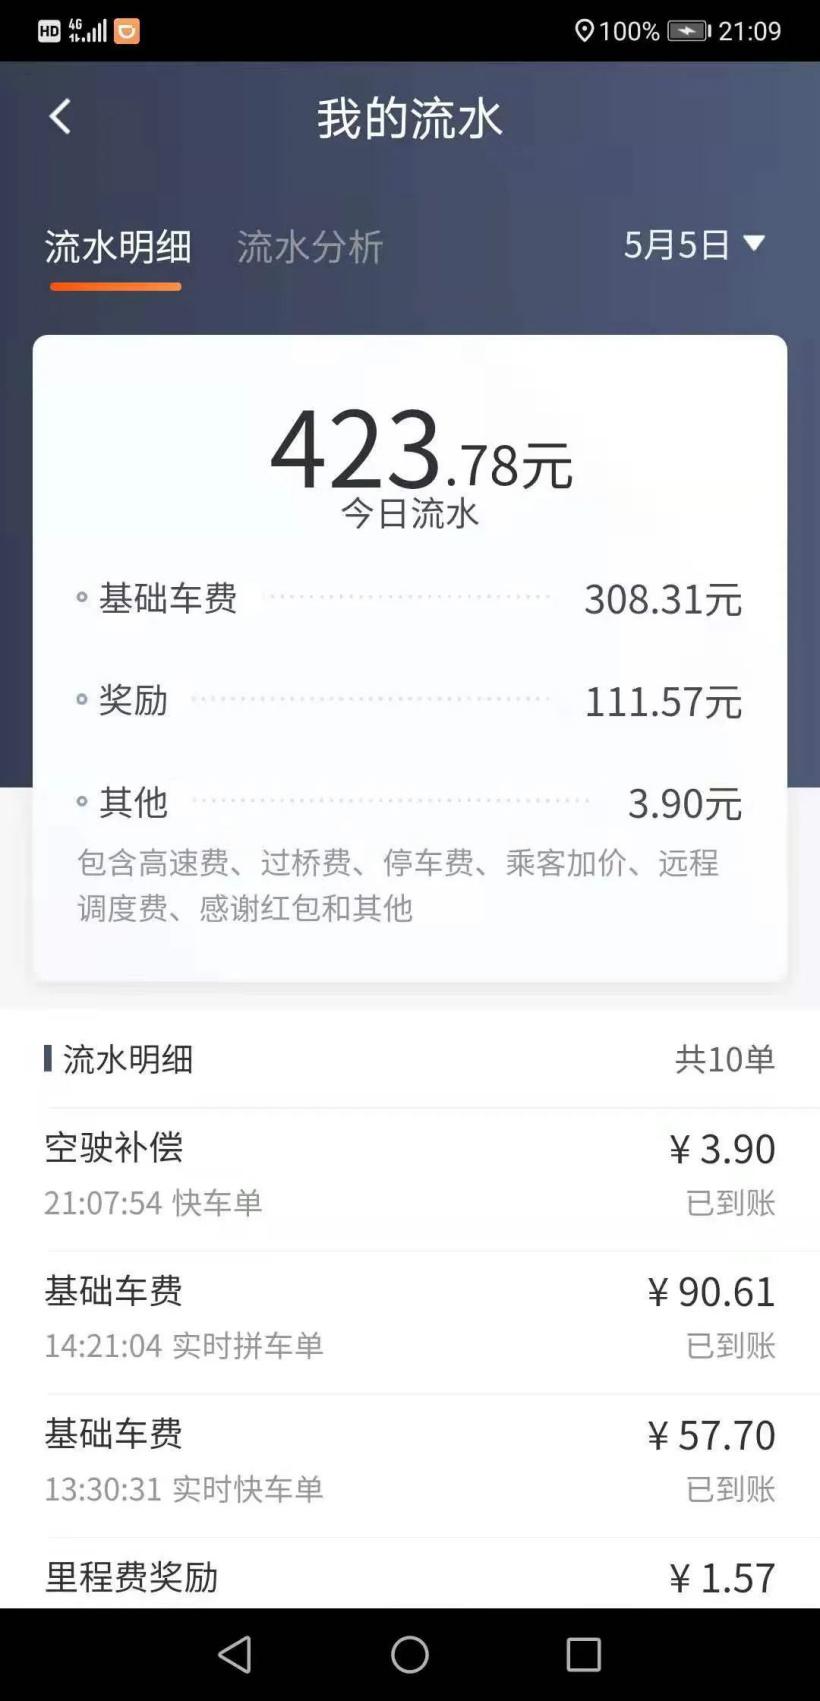 https://file.bayunhome.com/attachment/2021/5_7/a20e1b31c8444e50bade1d17f676059c.jpg